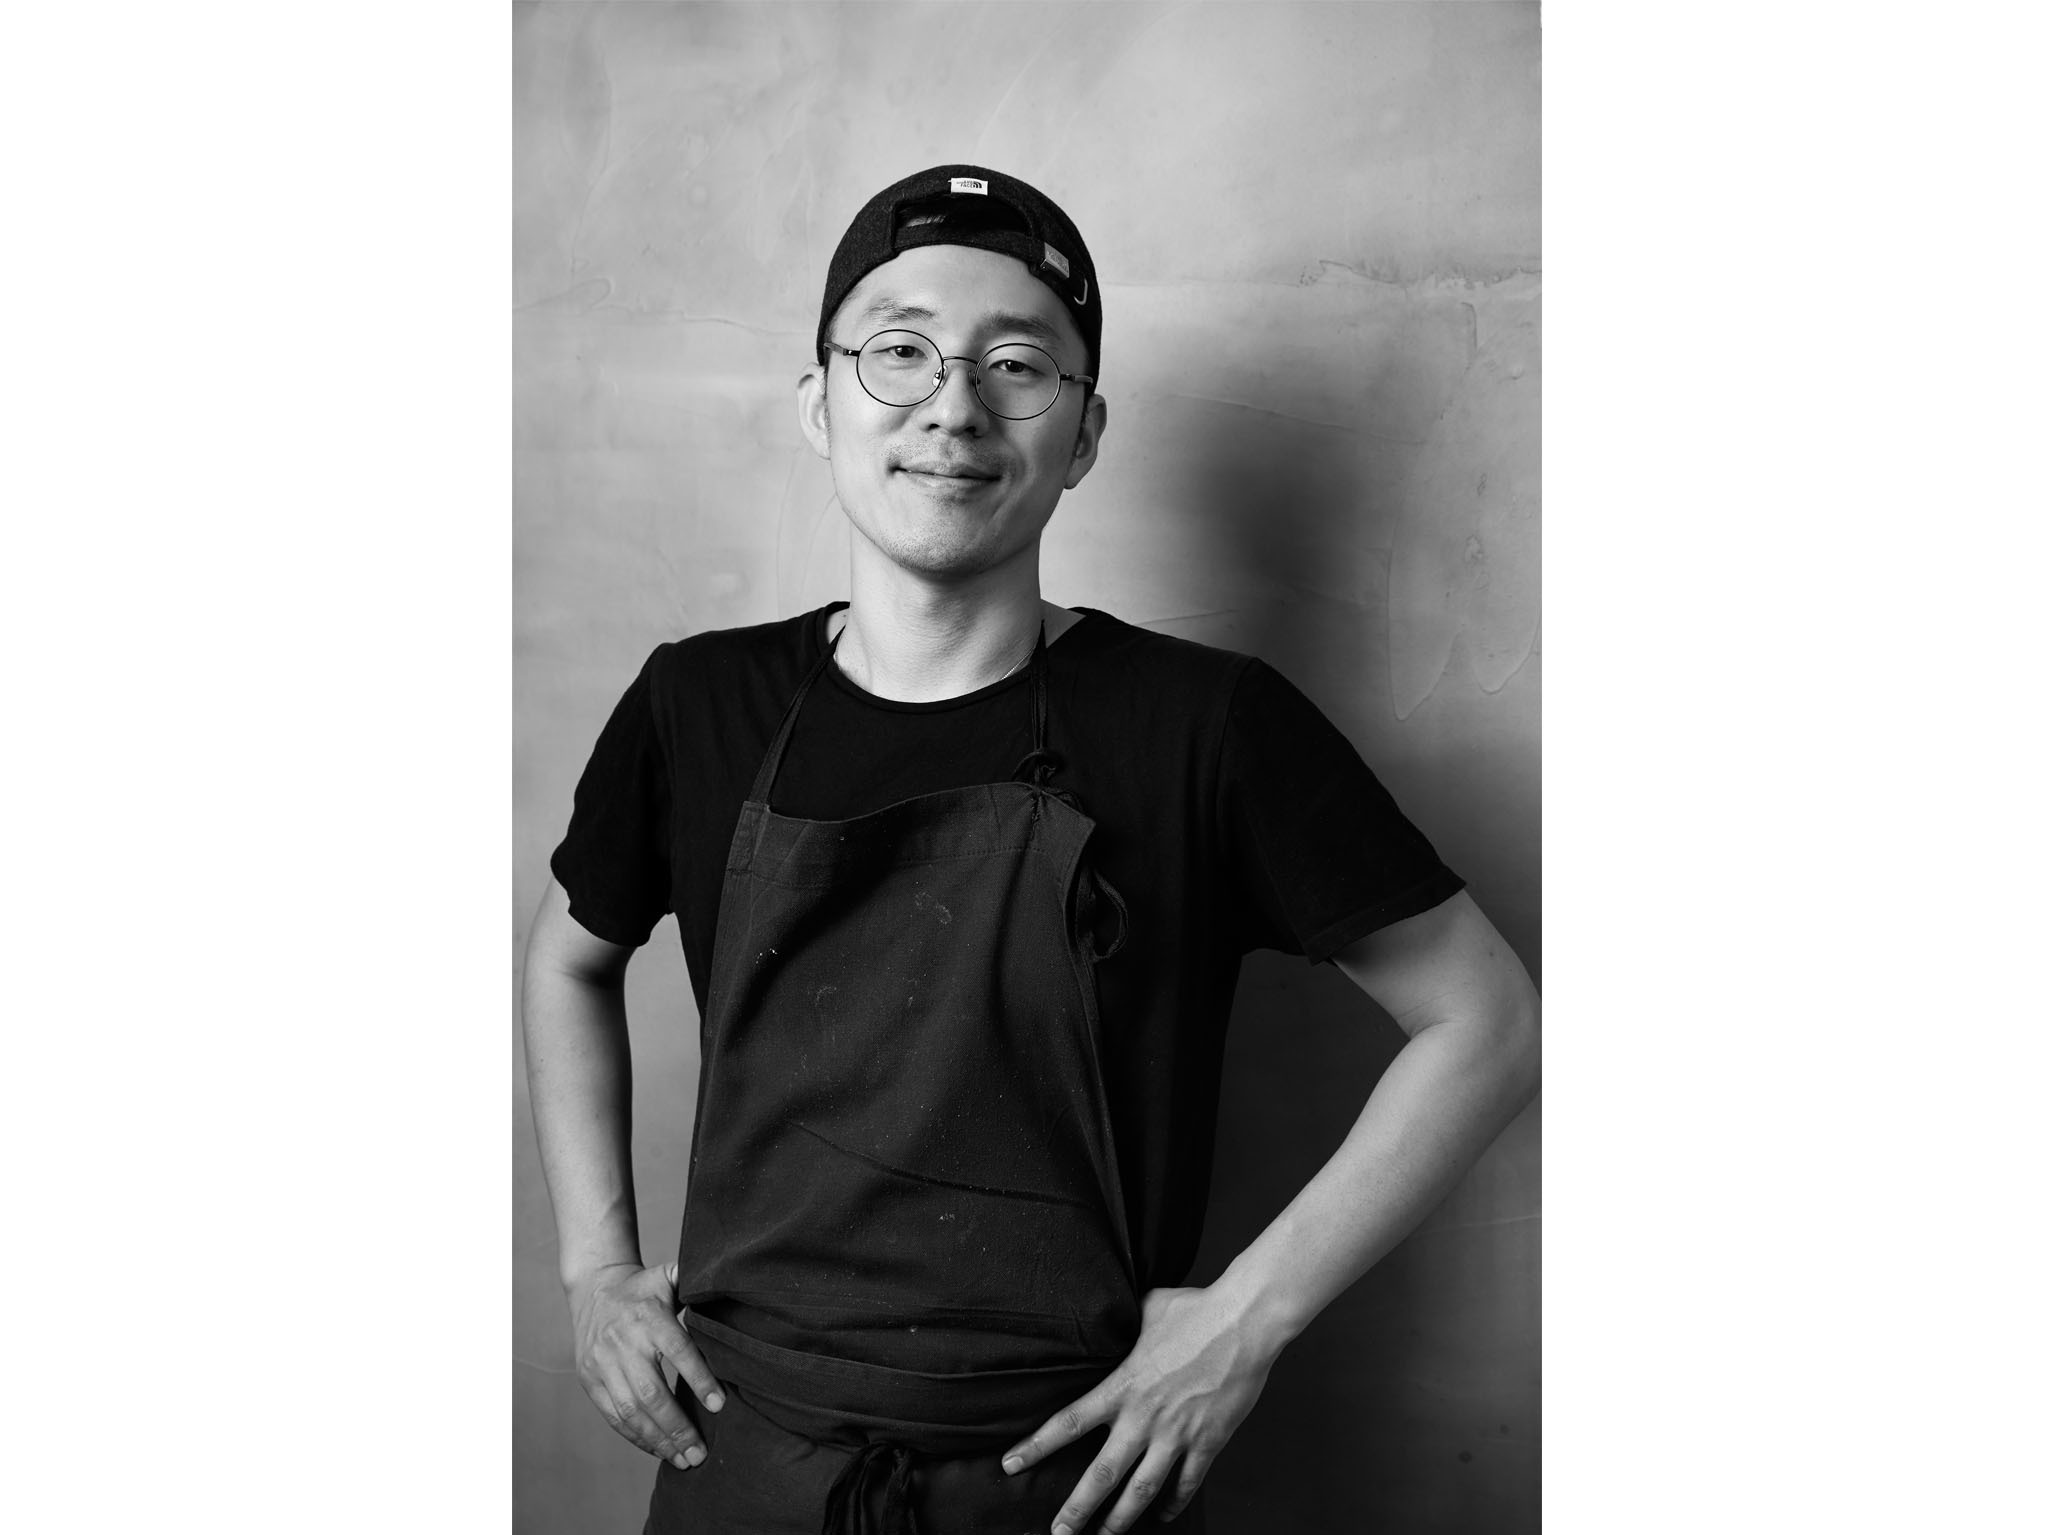 Kang Min-goo